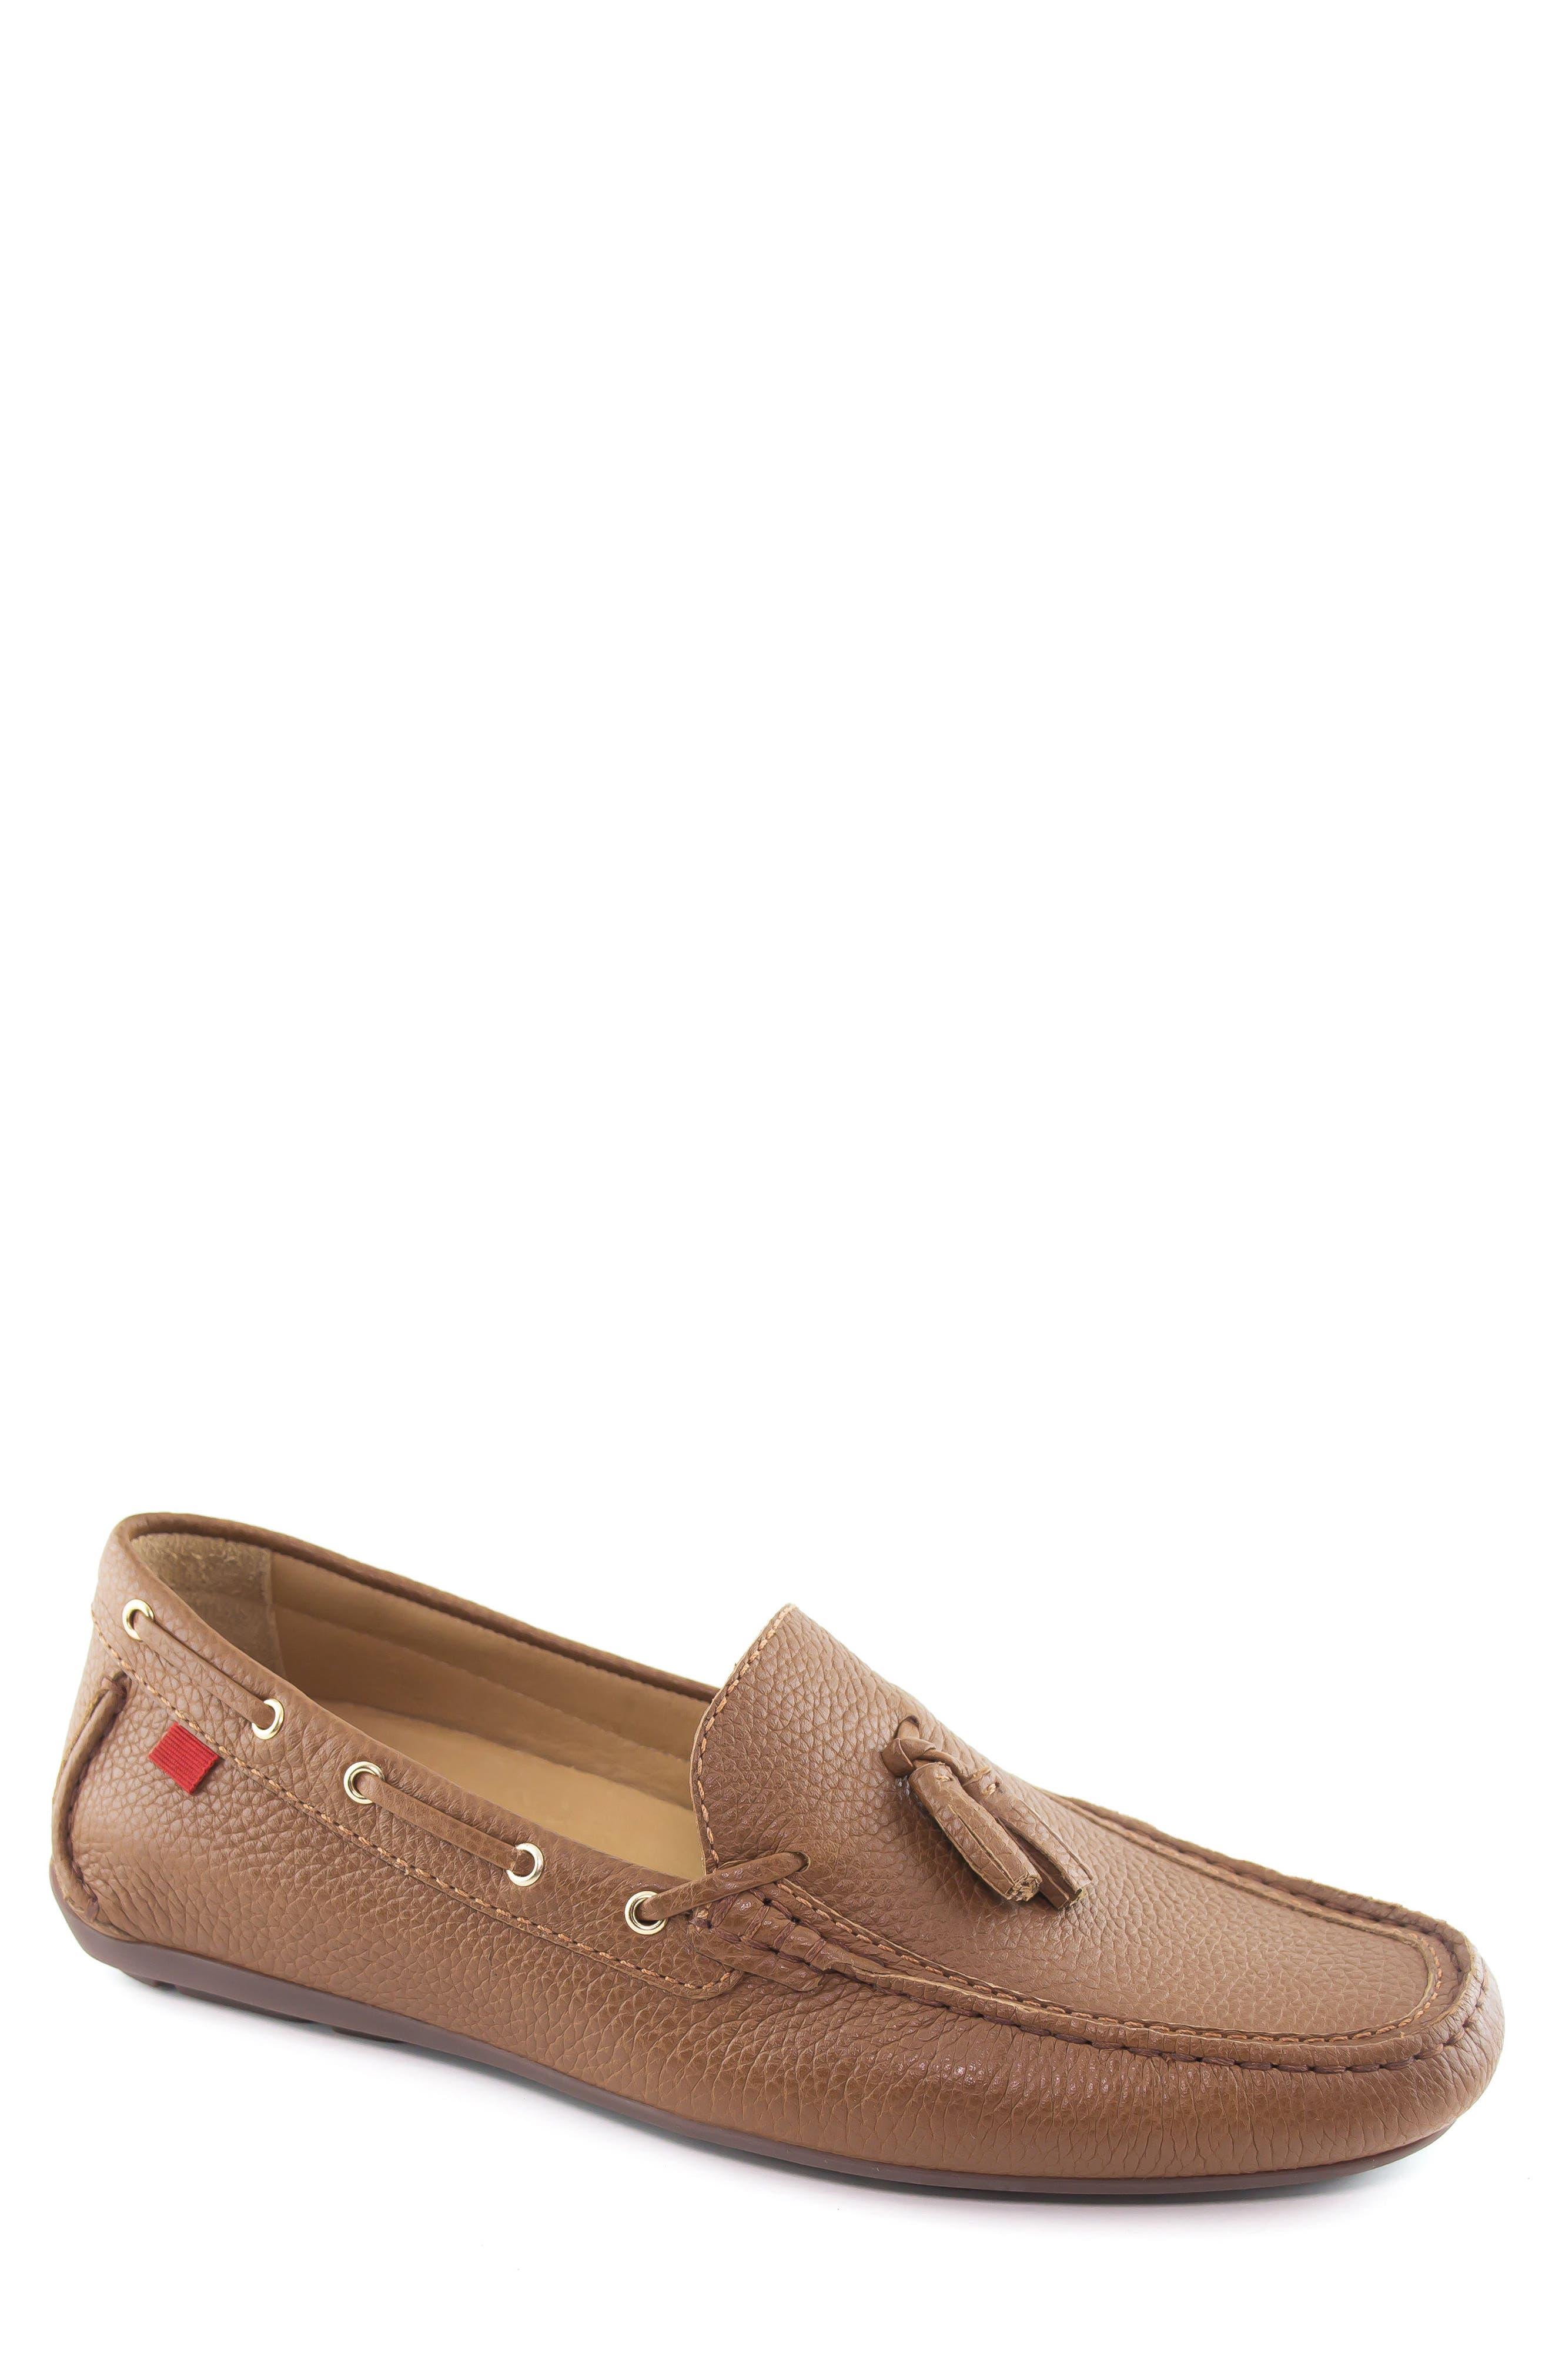 Bushwick Tasseled Driving Loafer,                             Main thumbnail 1, color,                             Cognac